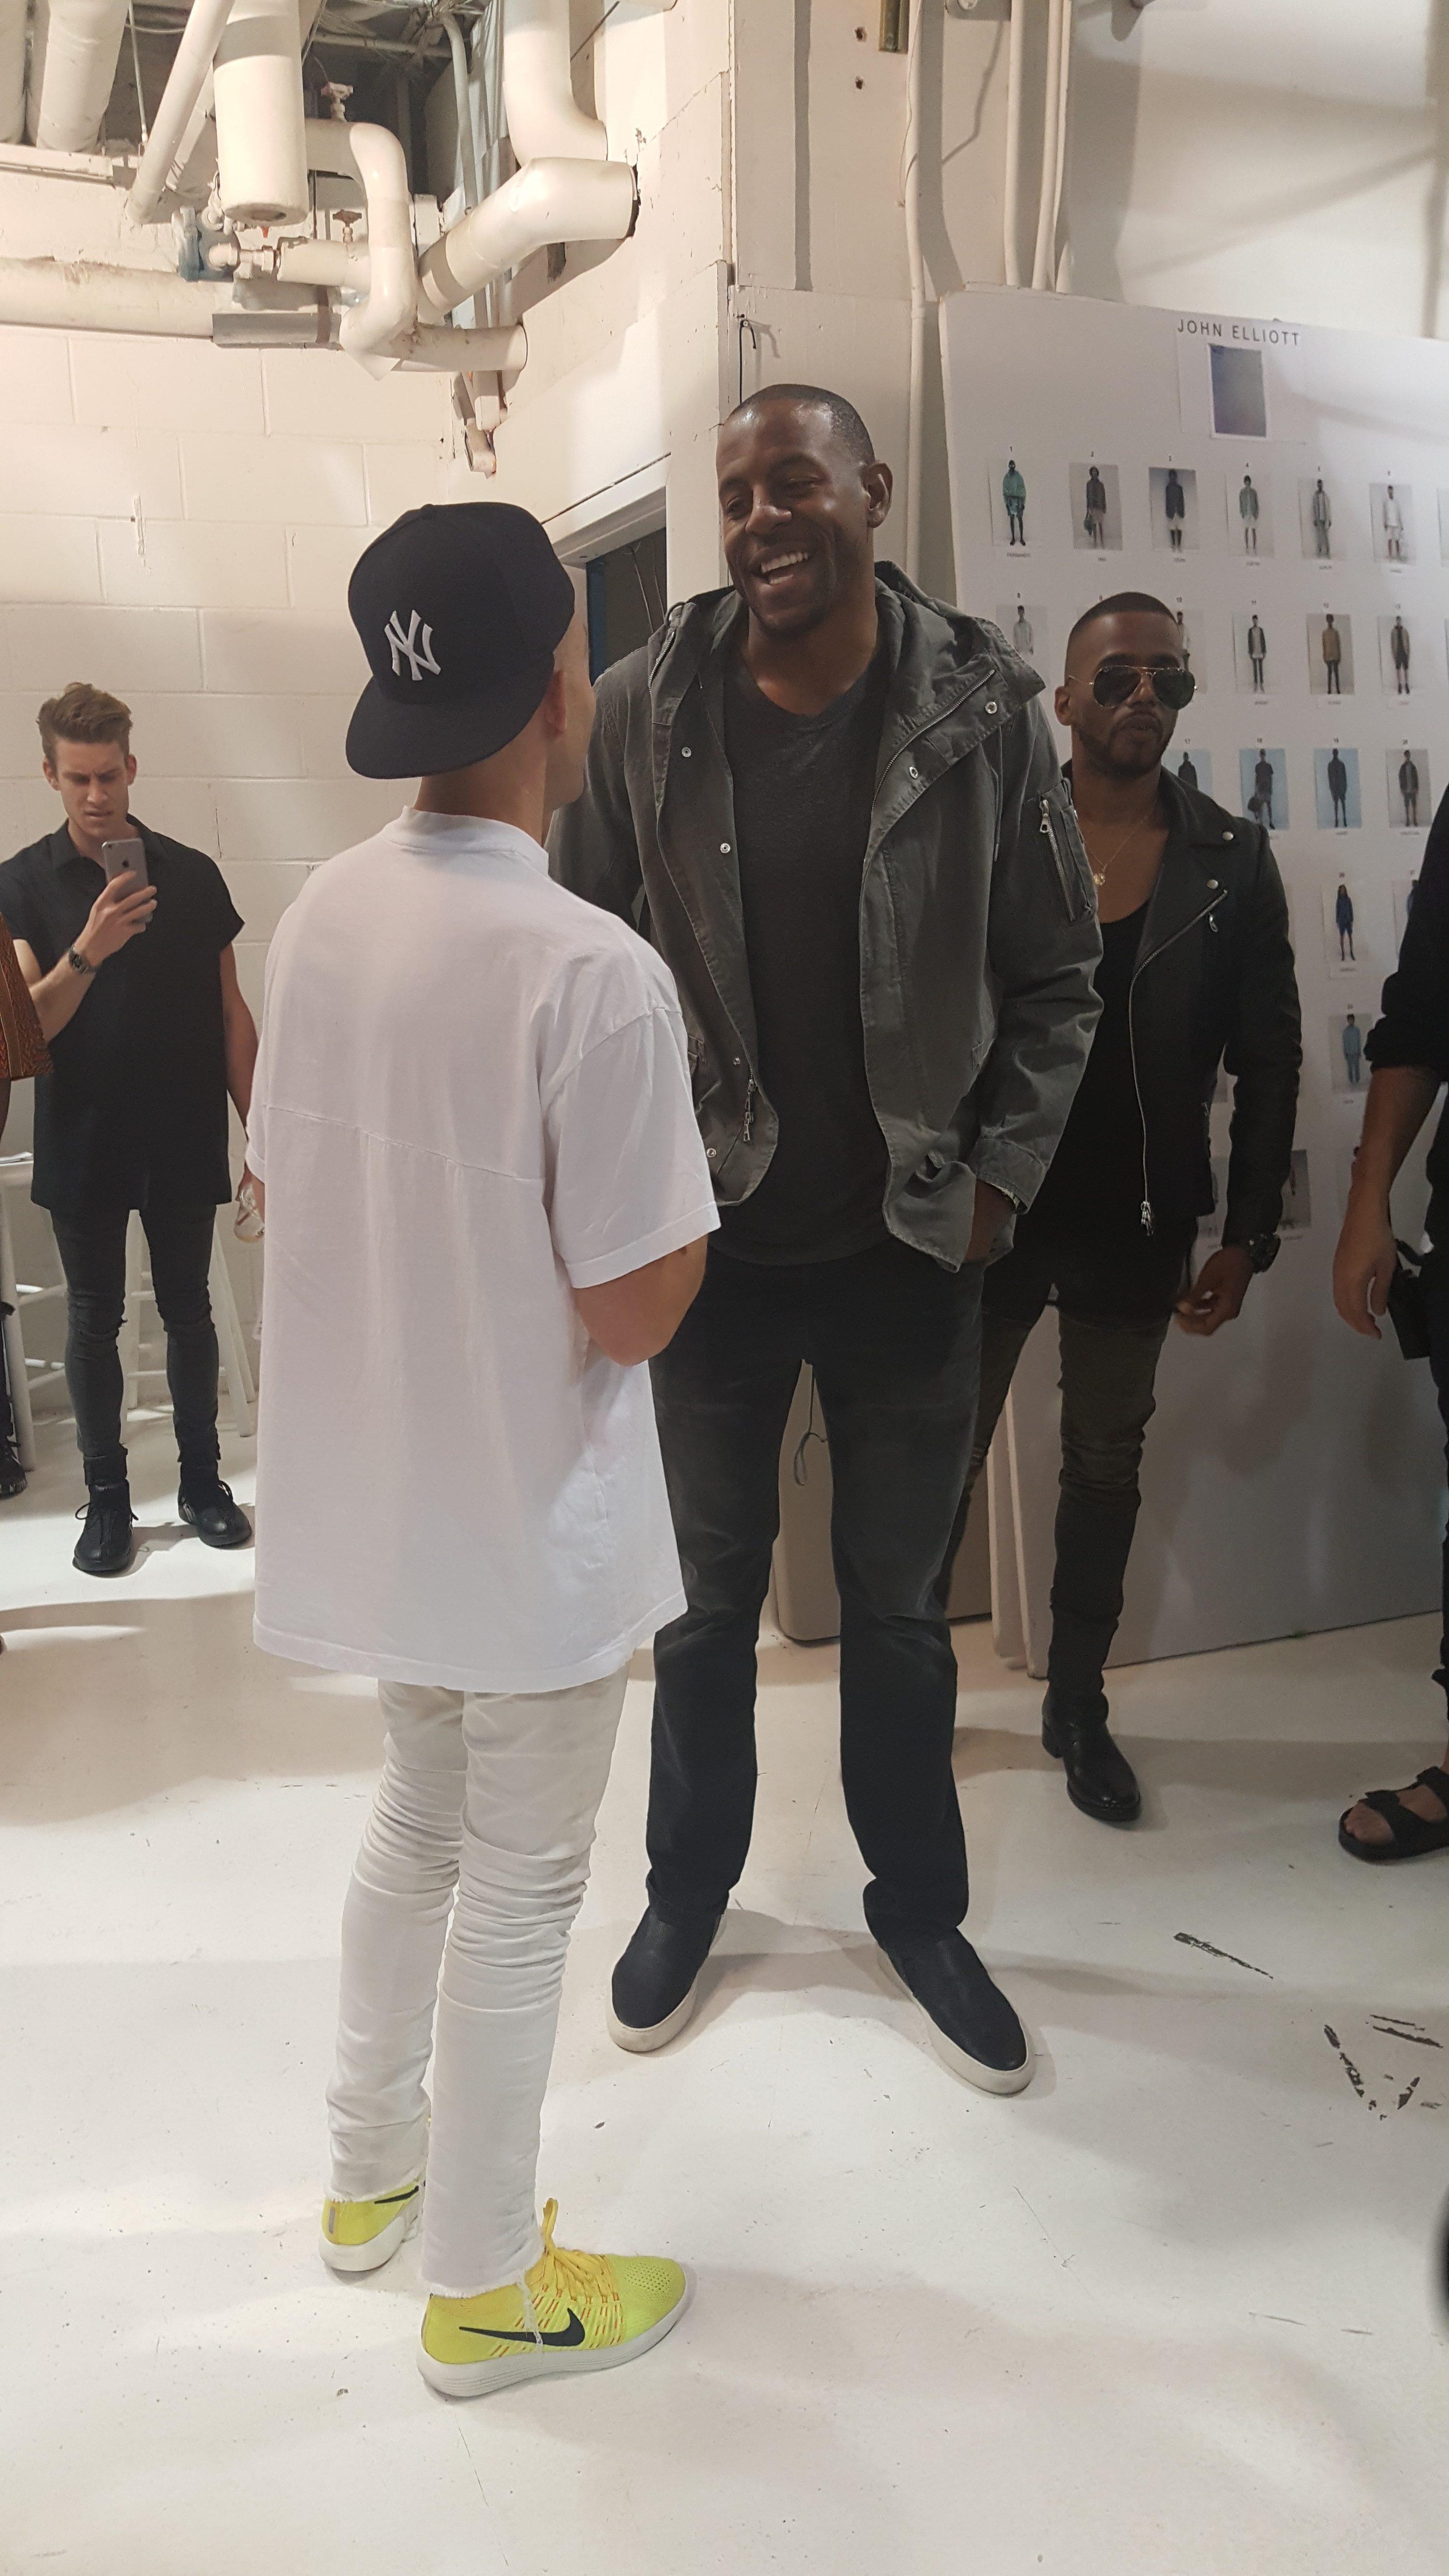 Andre-Iguodala-New-York-Fashion-Week-Mens-John-Elliot-